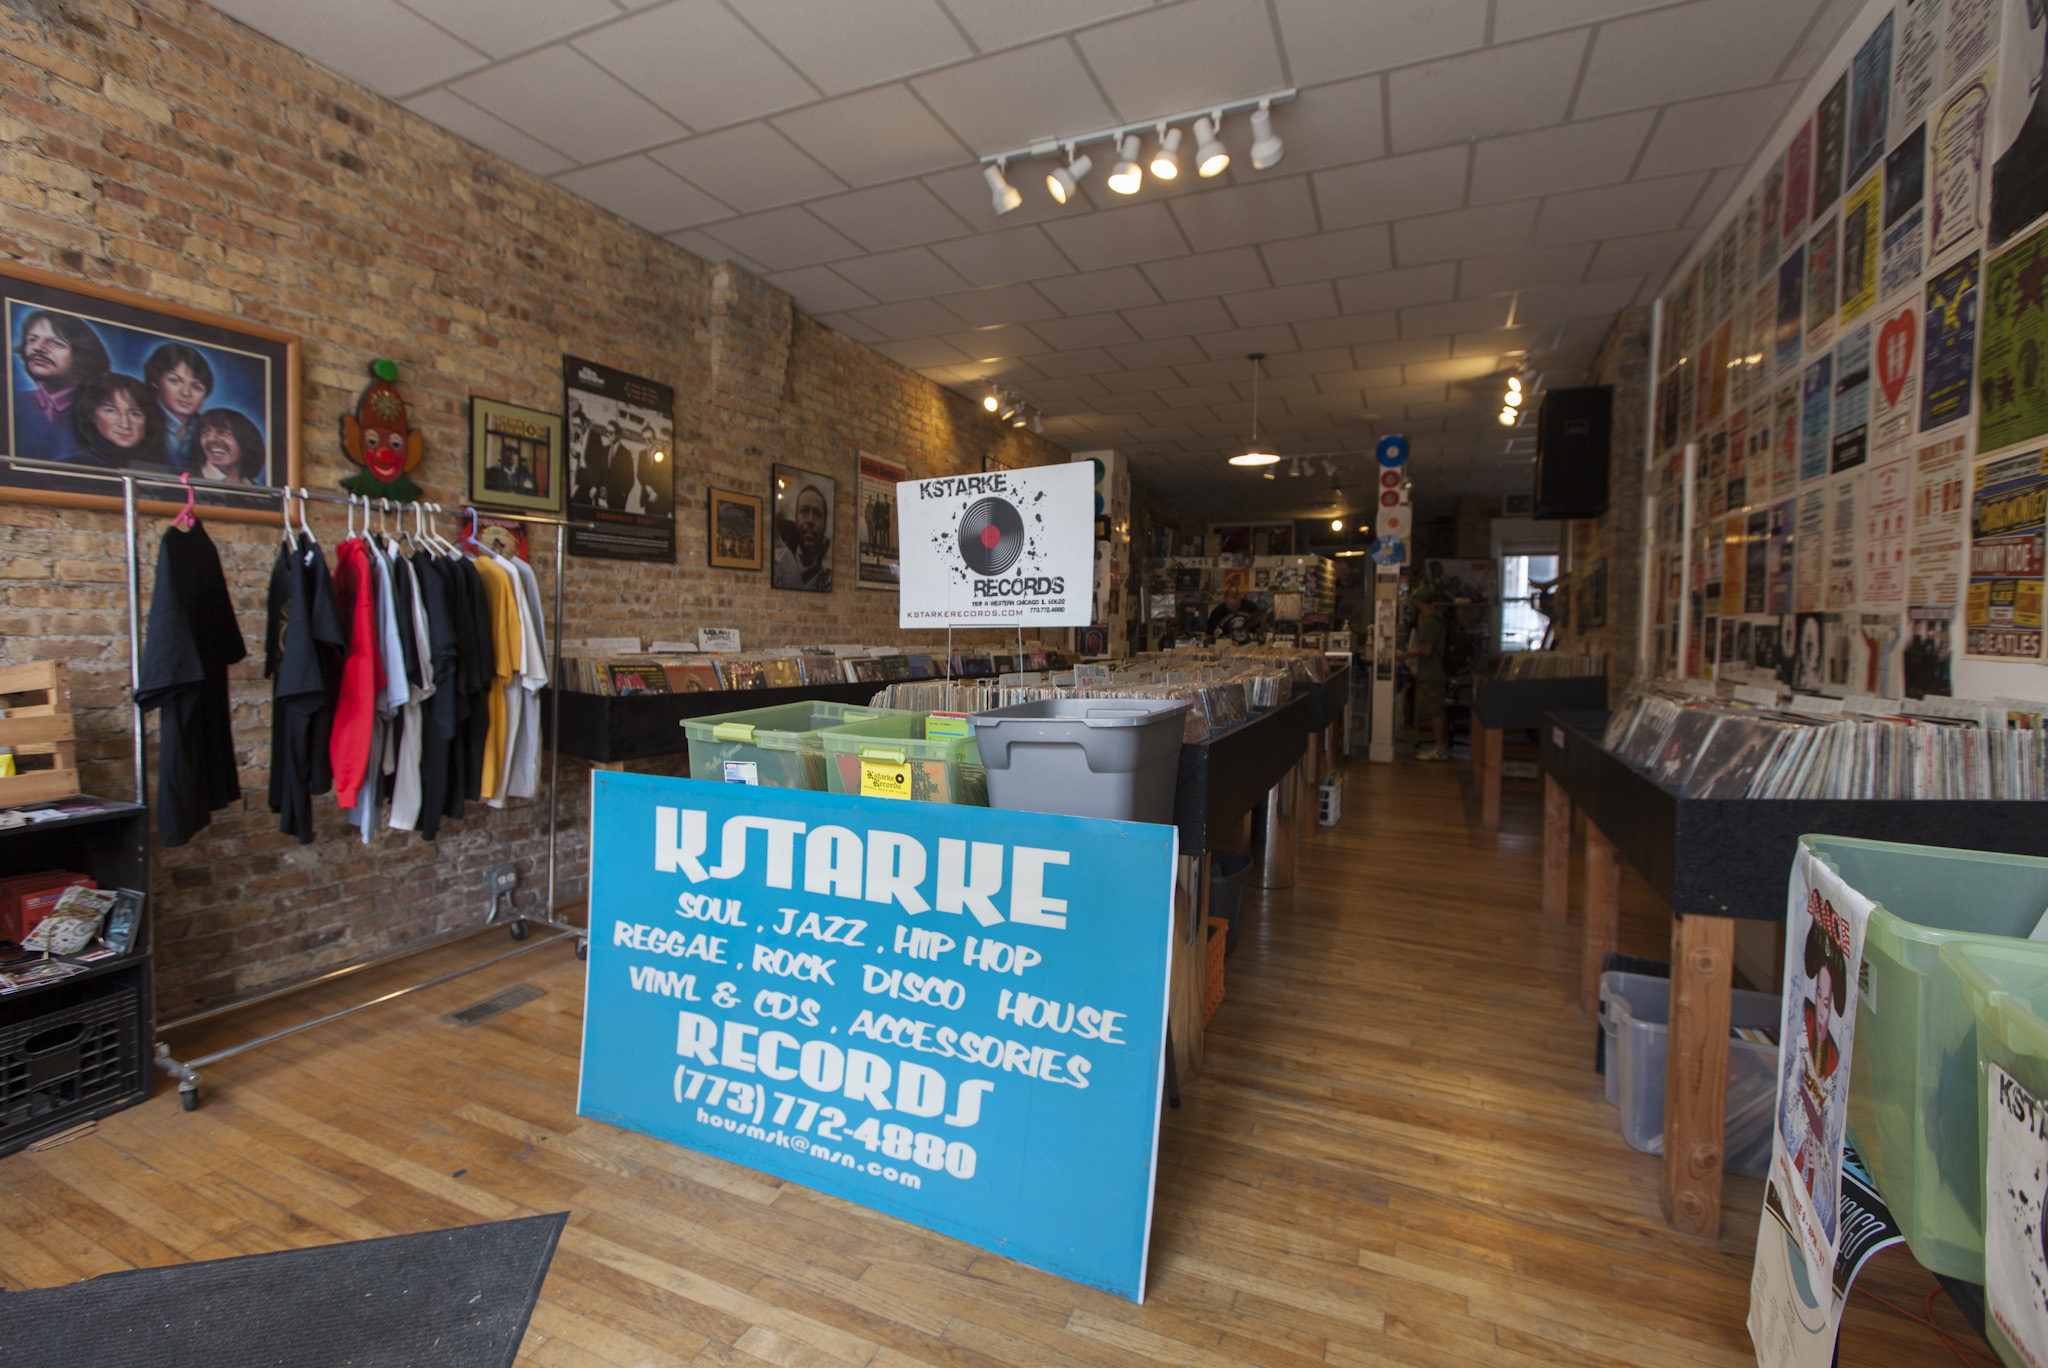 K Starke Records